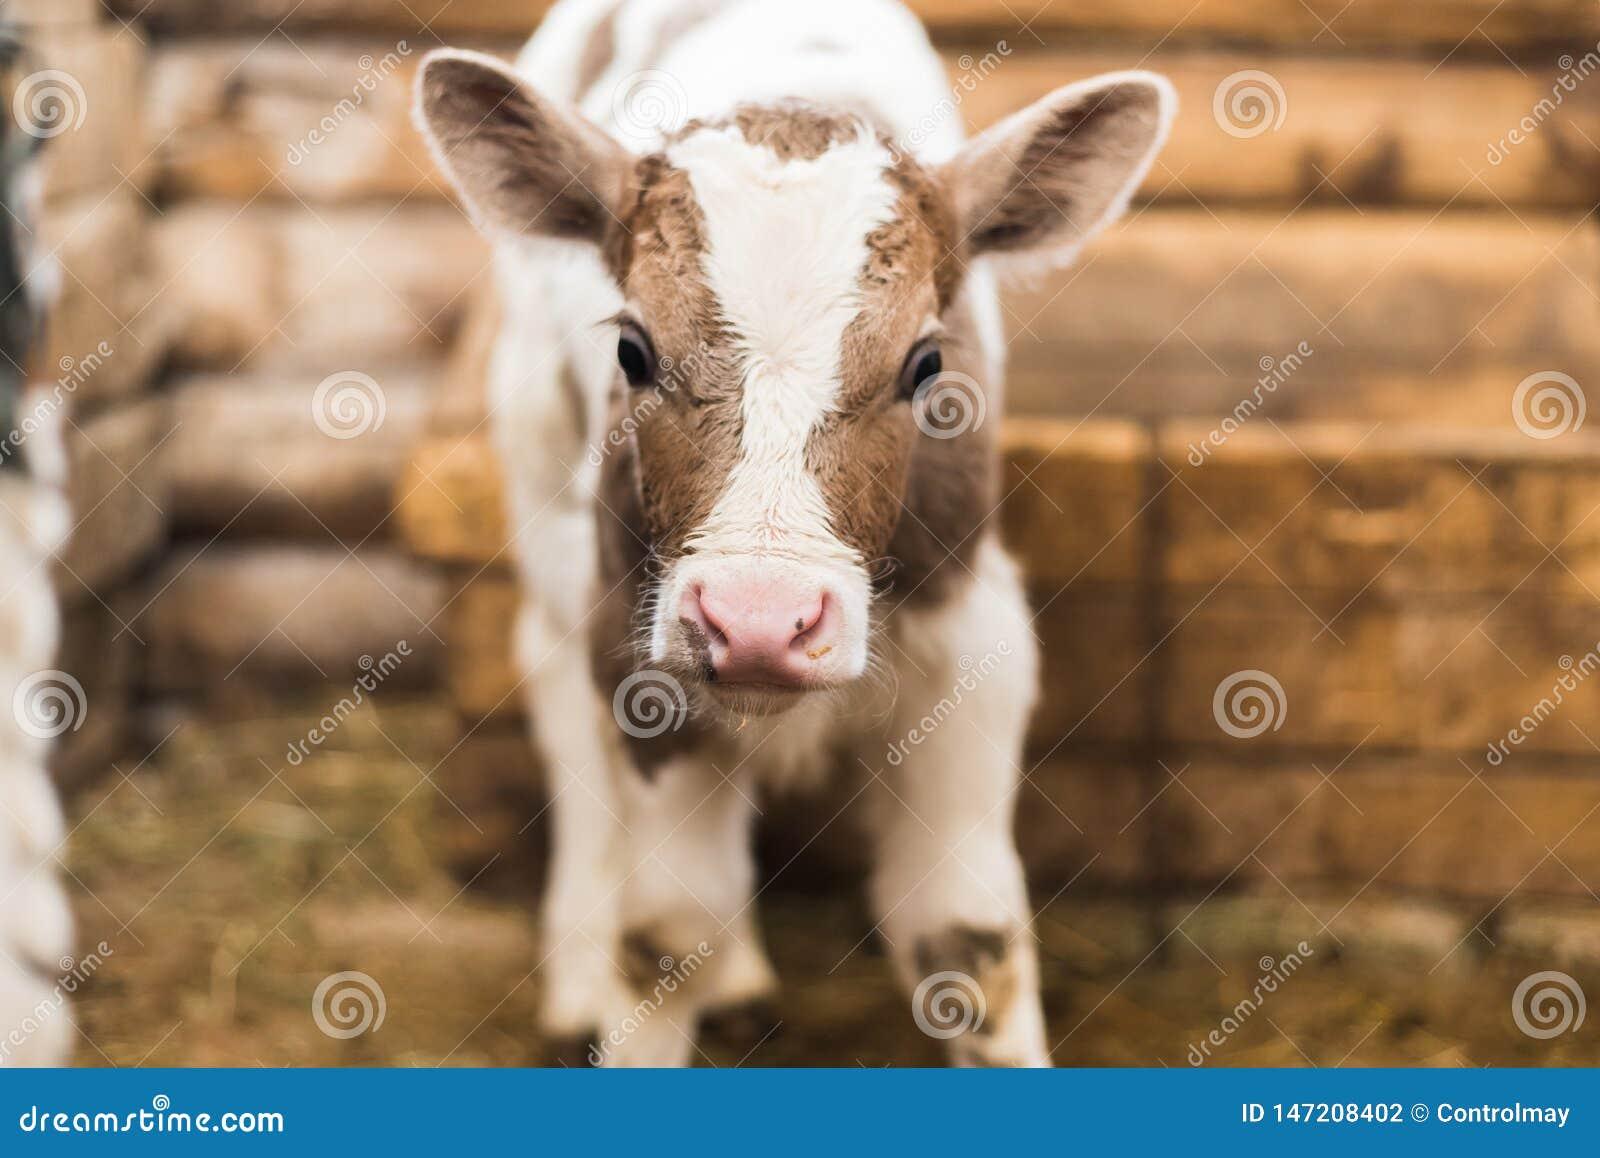 Милая икра на ферме